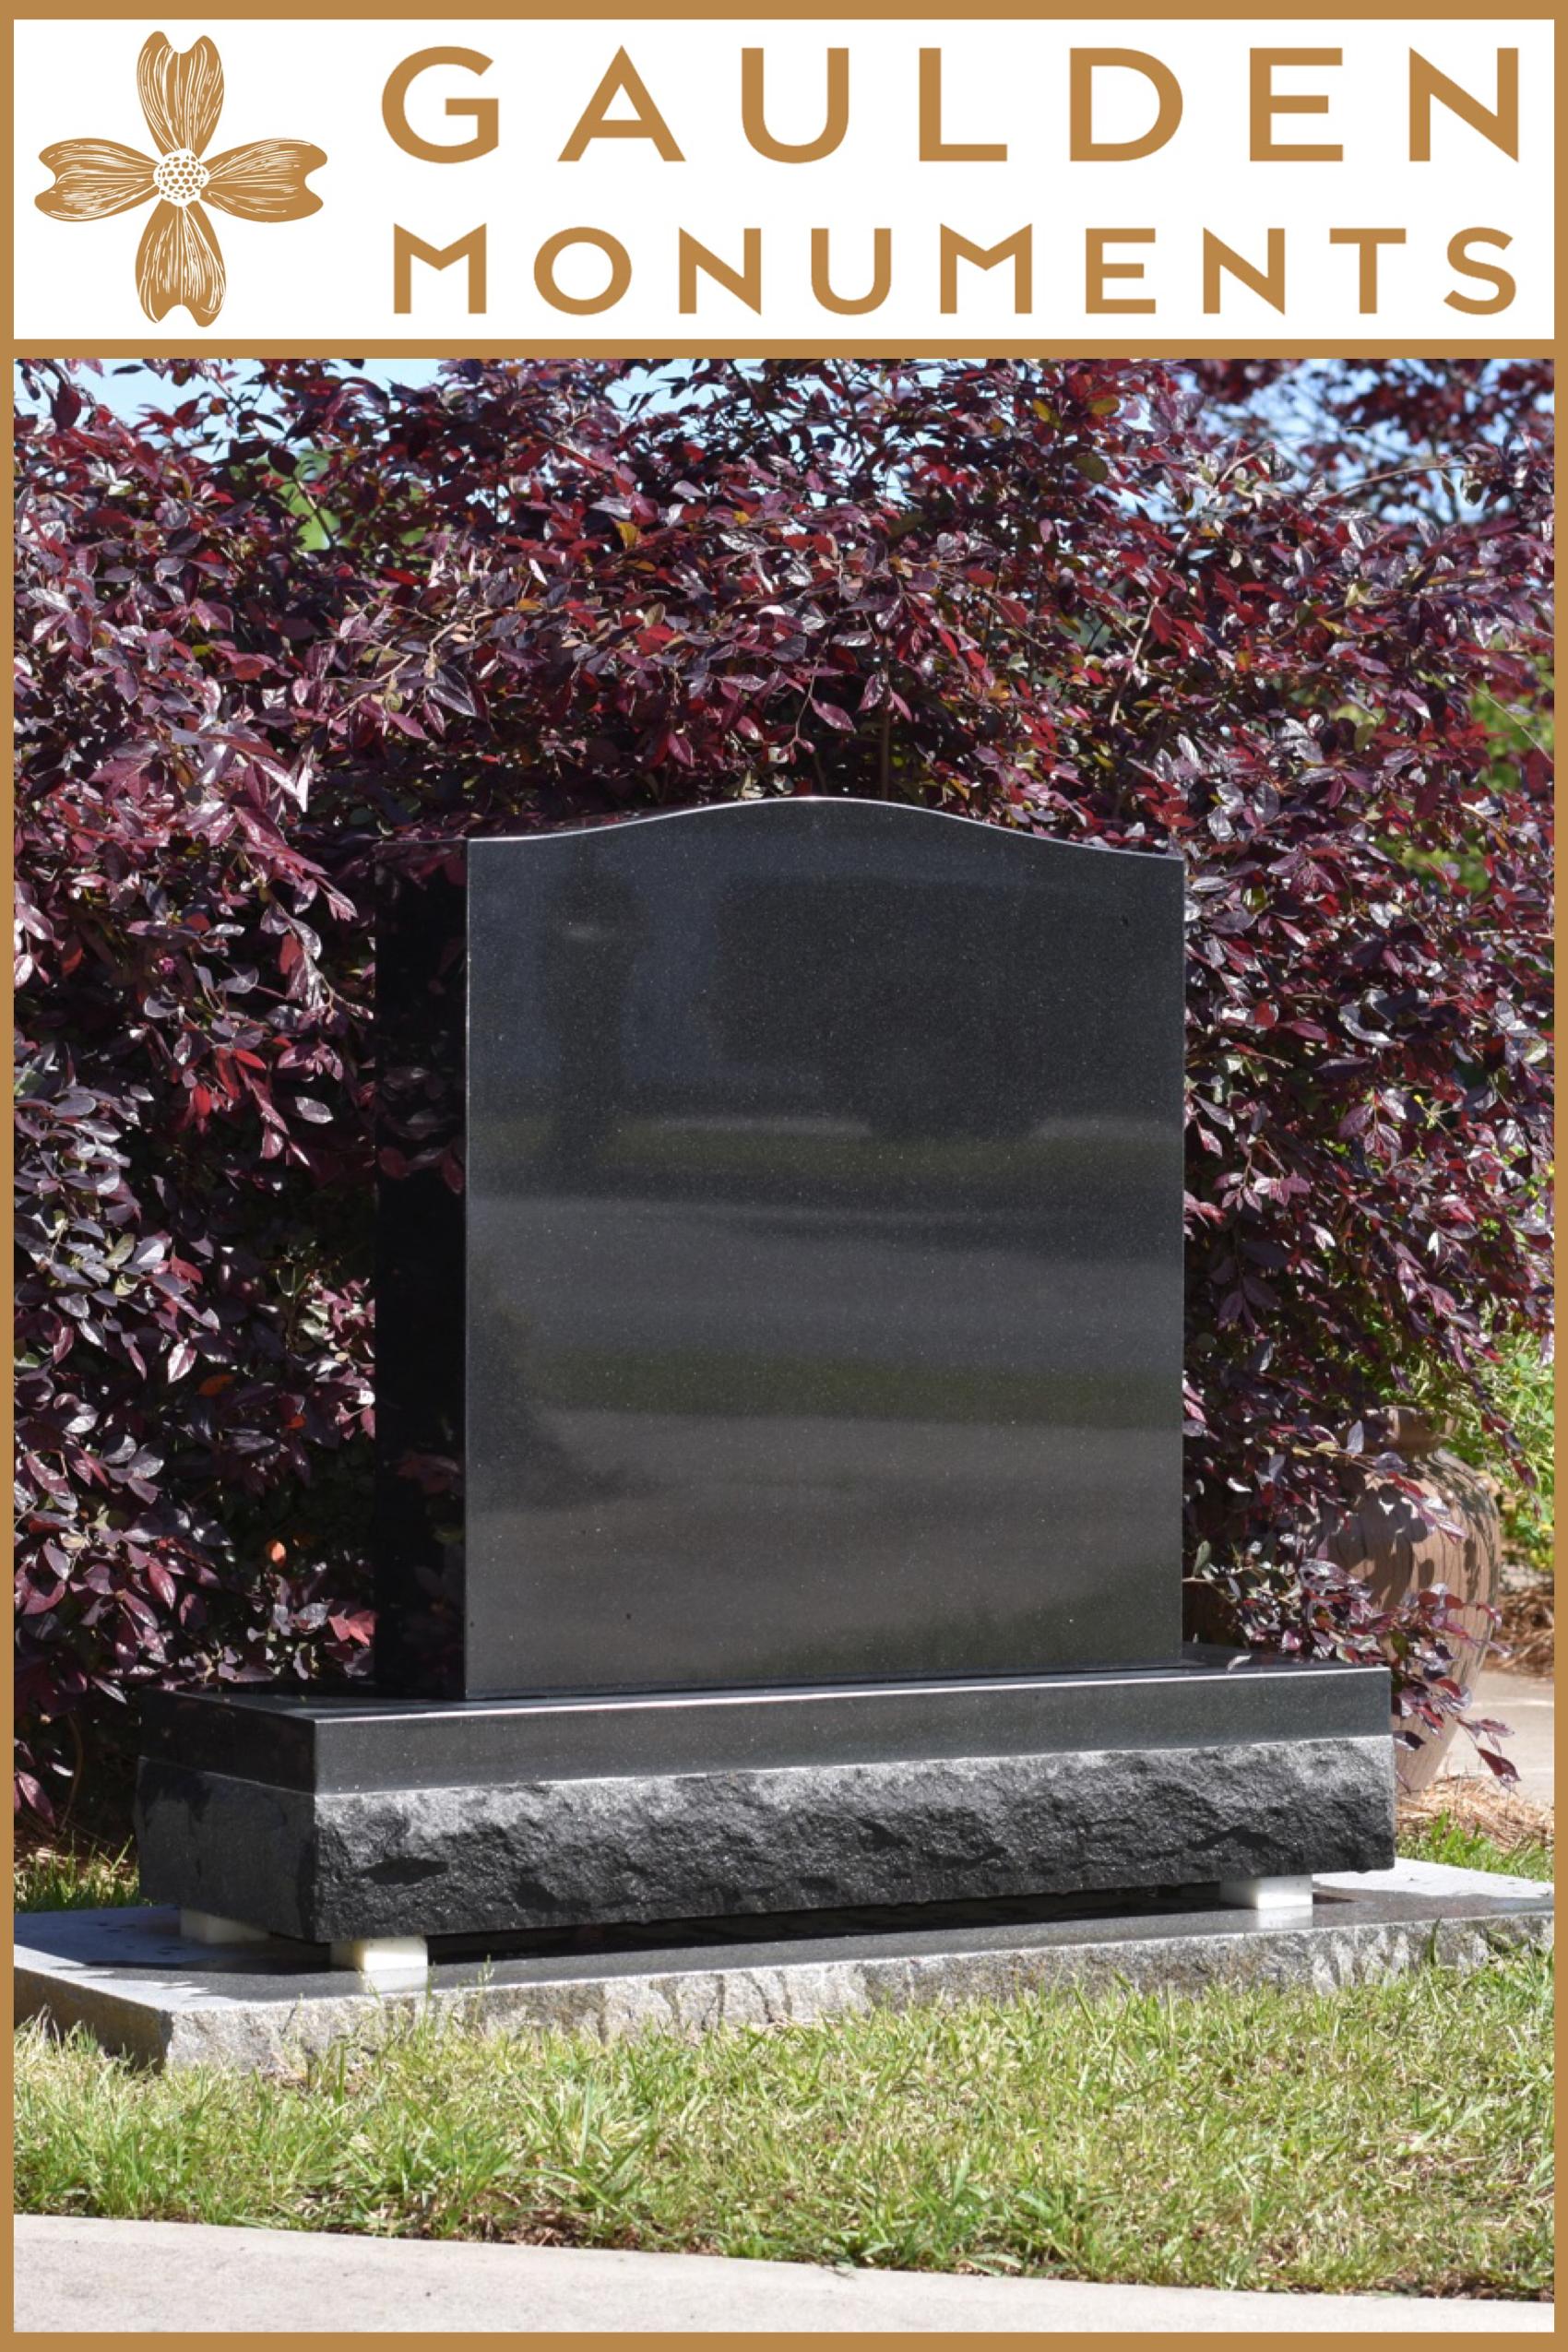 Large Single Upright Headstone Jet Black Granite Gaulden Monuments Headstones Monument Granite Monuments